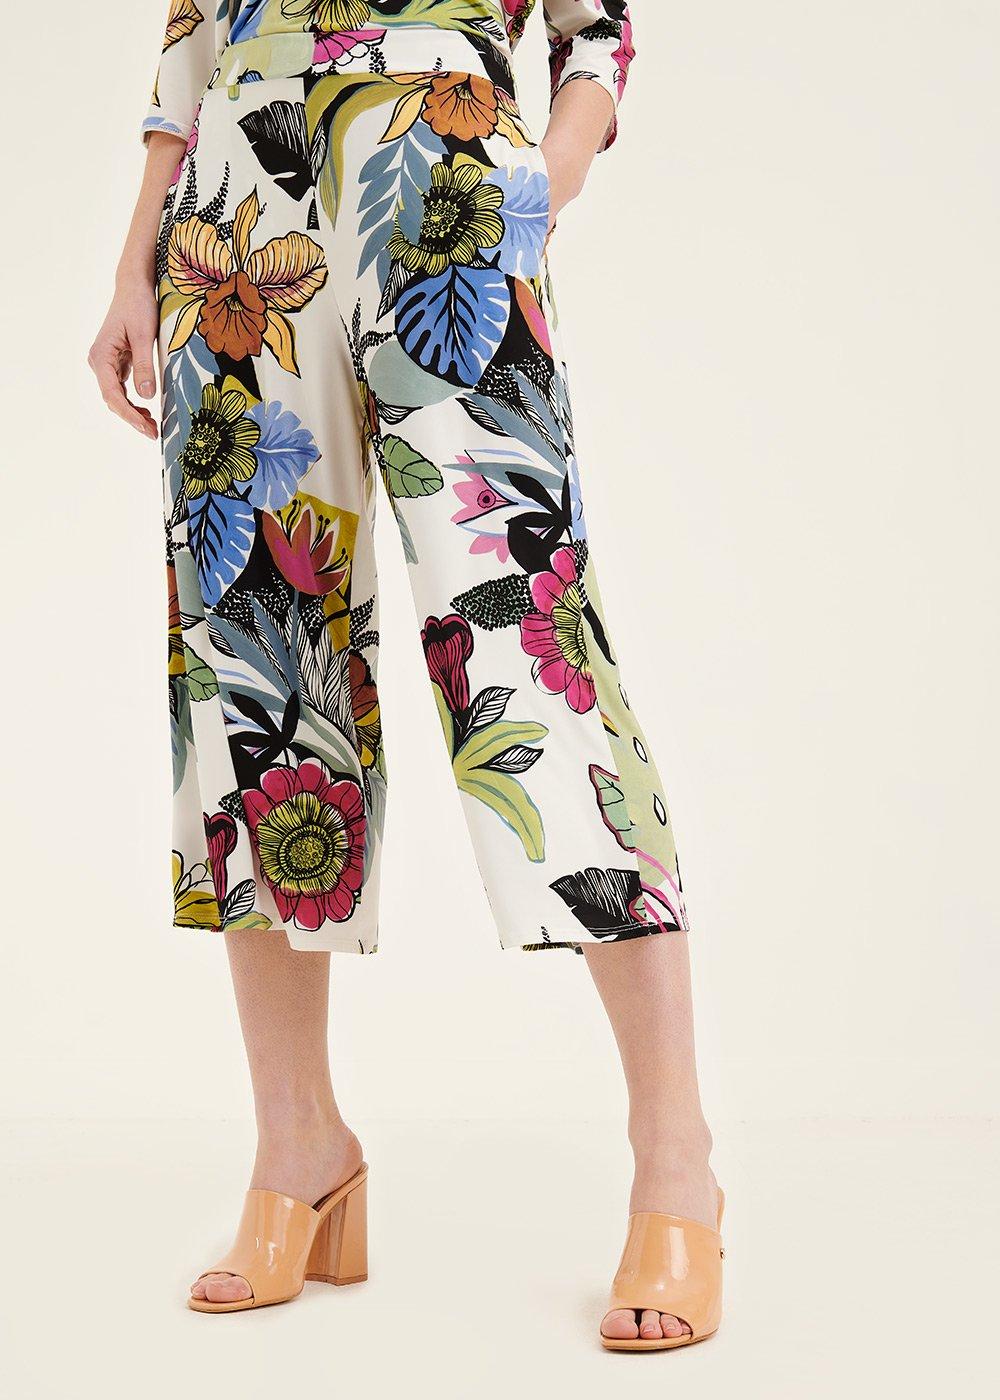 Pantalone Megan stampa fiorata - White /  Curcuma Fantasia - Donna